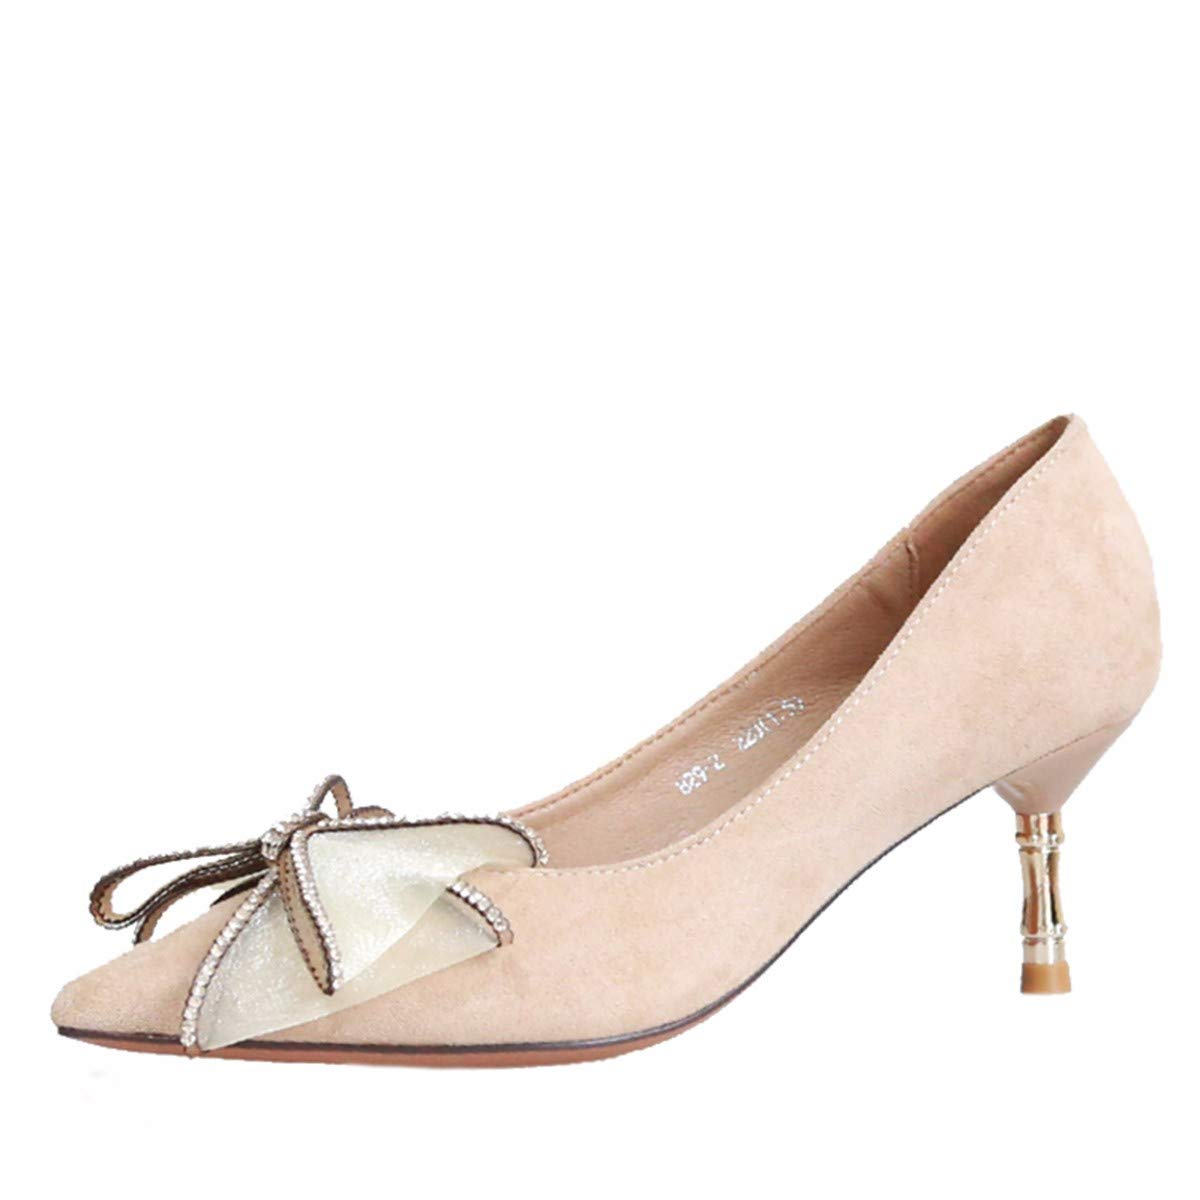 KPHY Damenschuhe/Herbst Eleganten Bogen Temperament Damenschuhe Gut Mit Dem Nahen Moderne Bohrer Spitze Flache Schuhe.37 Schwarz